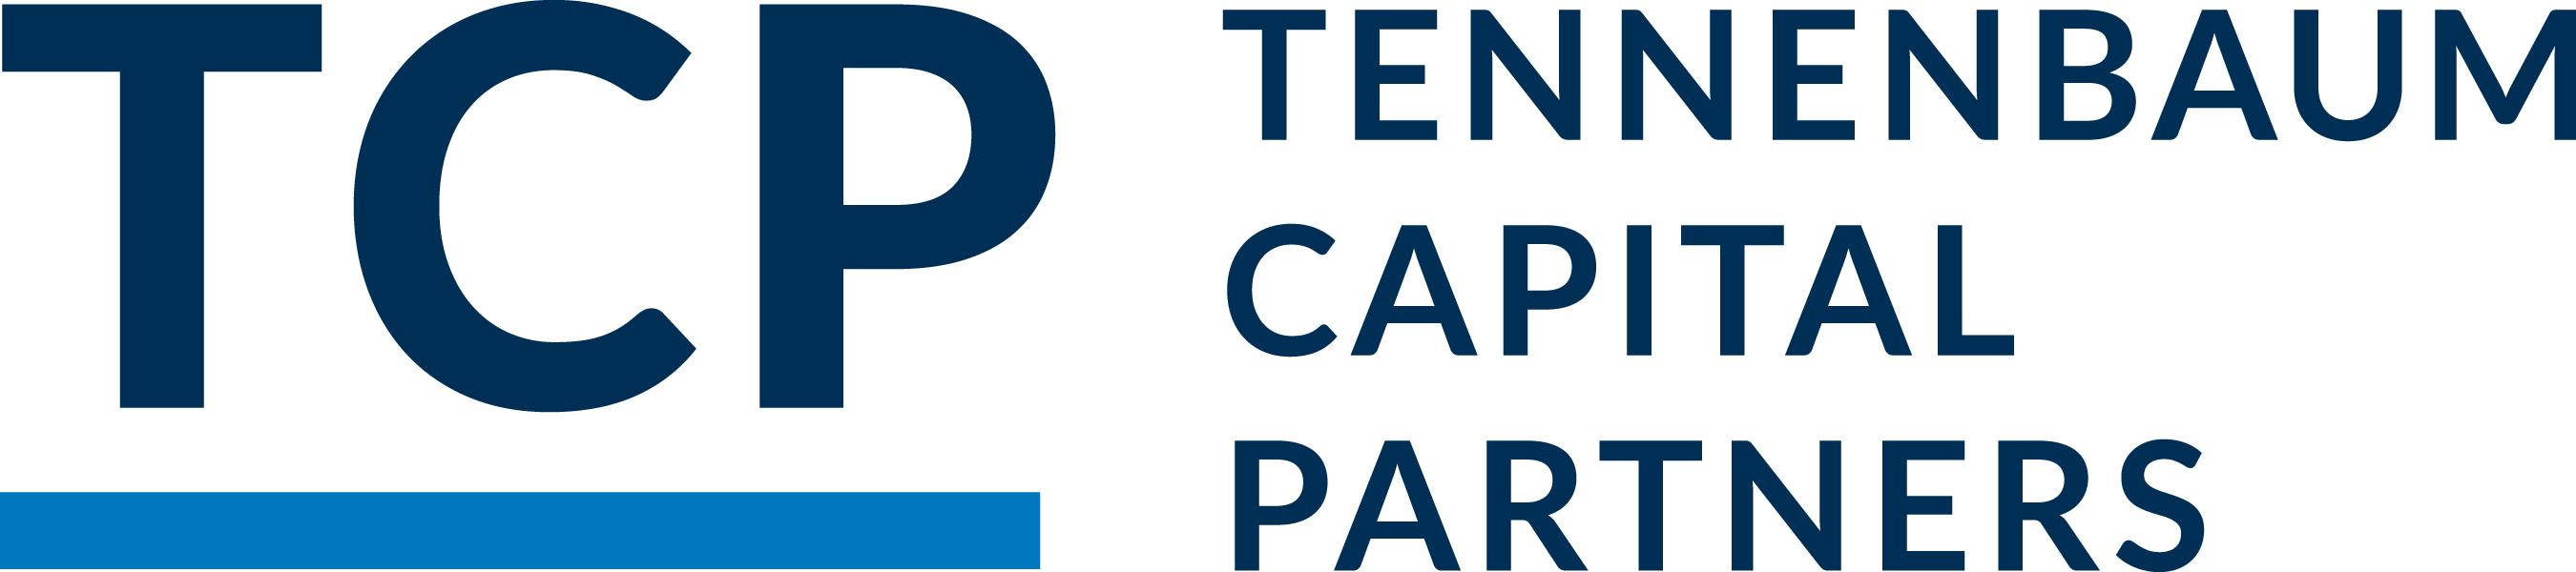 Tennenbaum Capital Partners, LLC